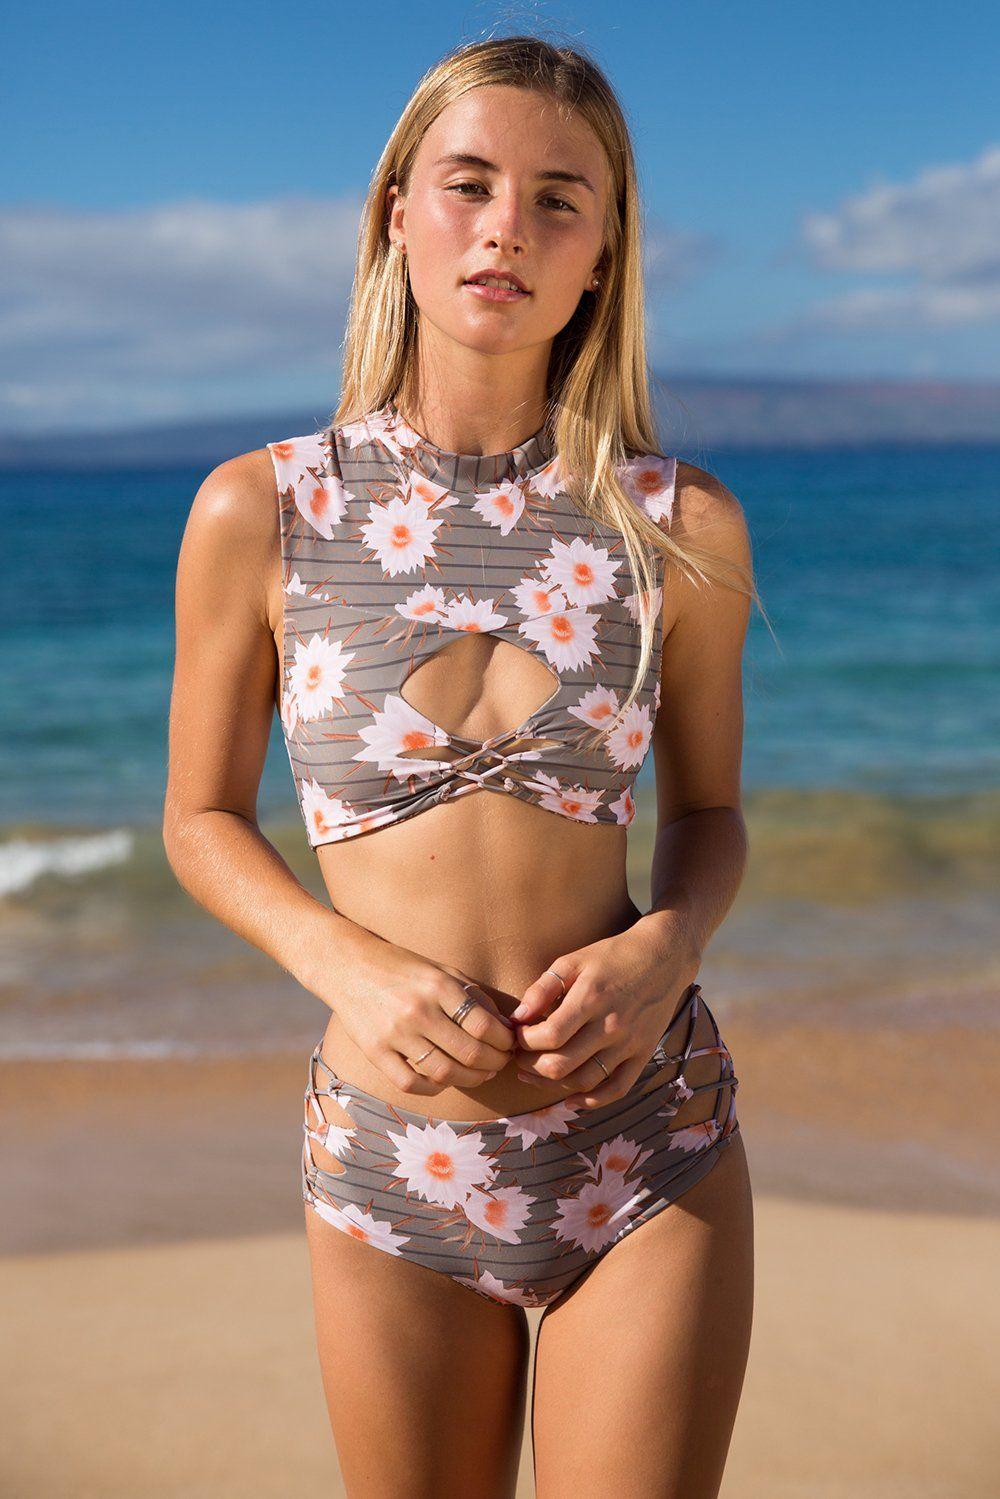 7e674c0919b019 FINAL SALE. The ACACIA Swimwear Amalfi Top features a cropped bikini top  with cutout and criss cross detailing